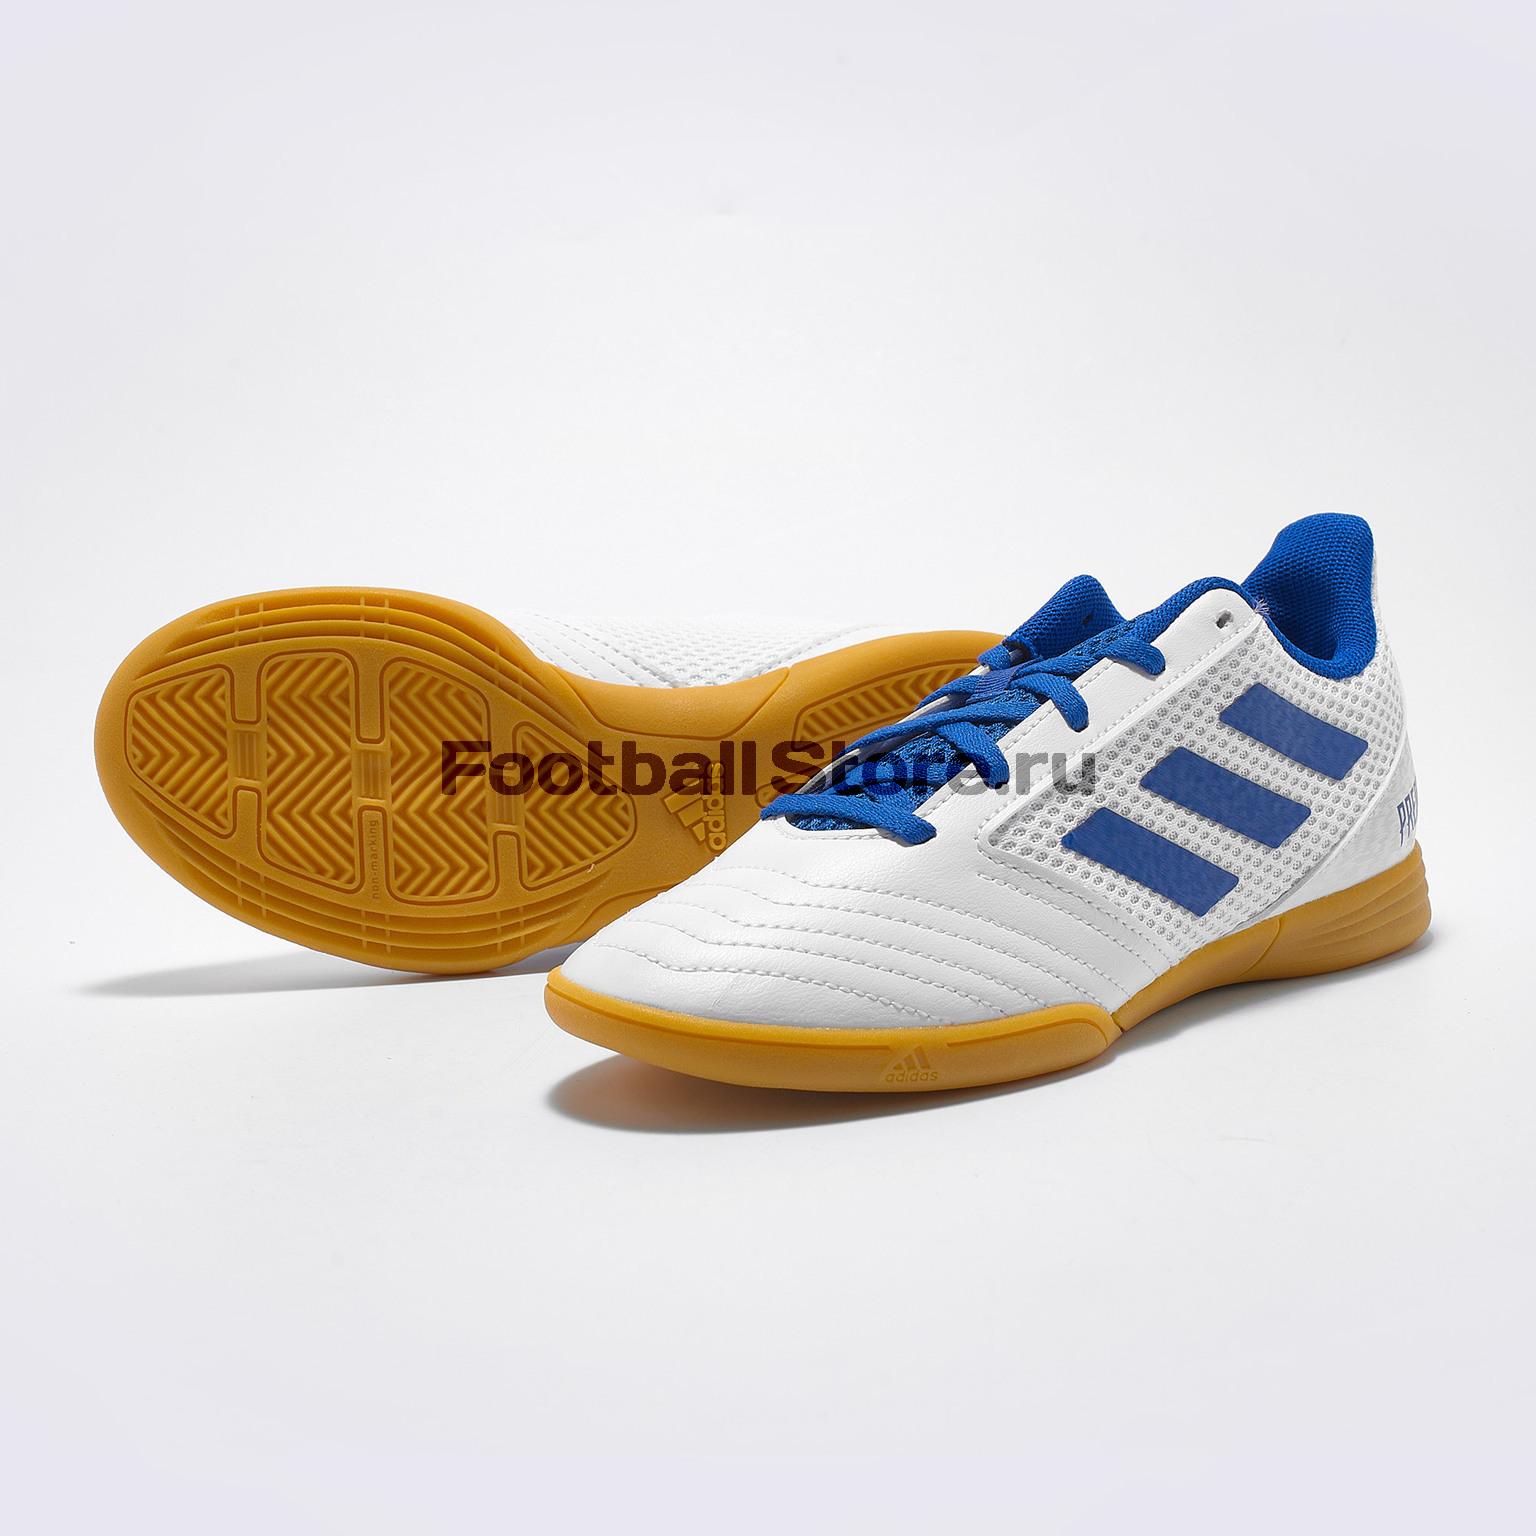 цена на Футзалки детские Adidas Predator 19.4 IN CM8553